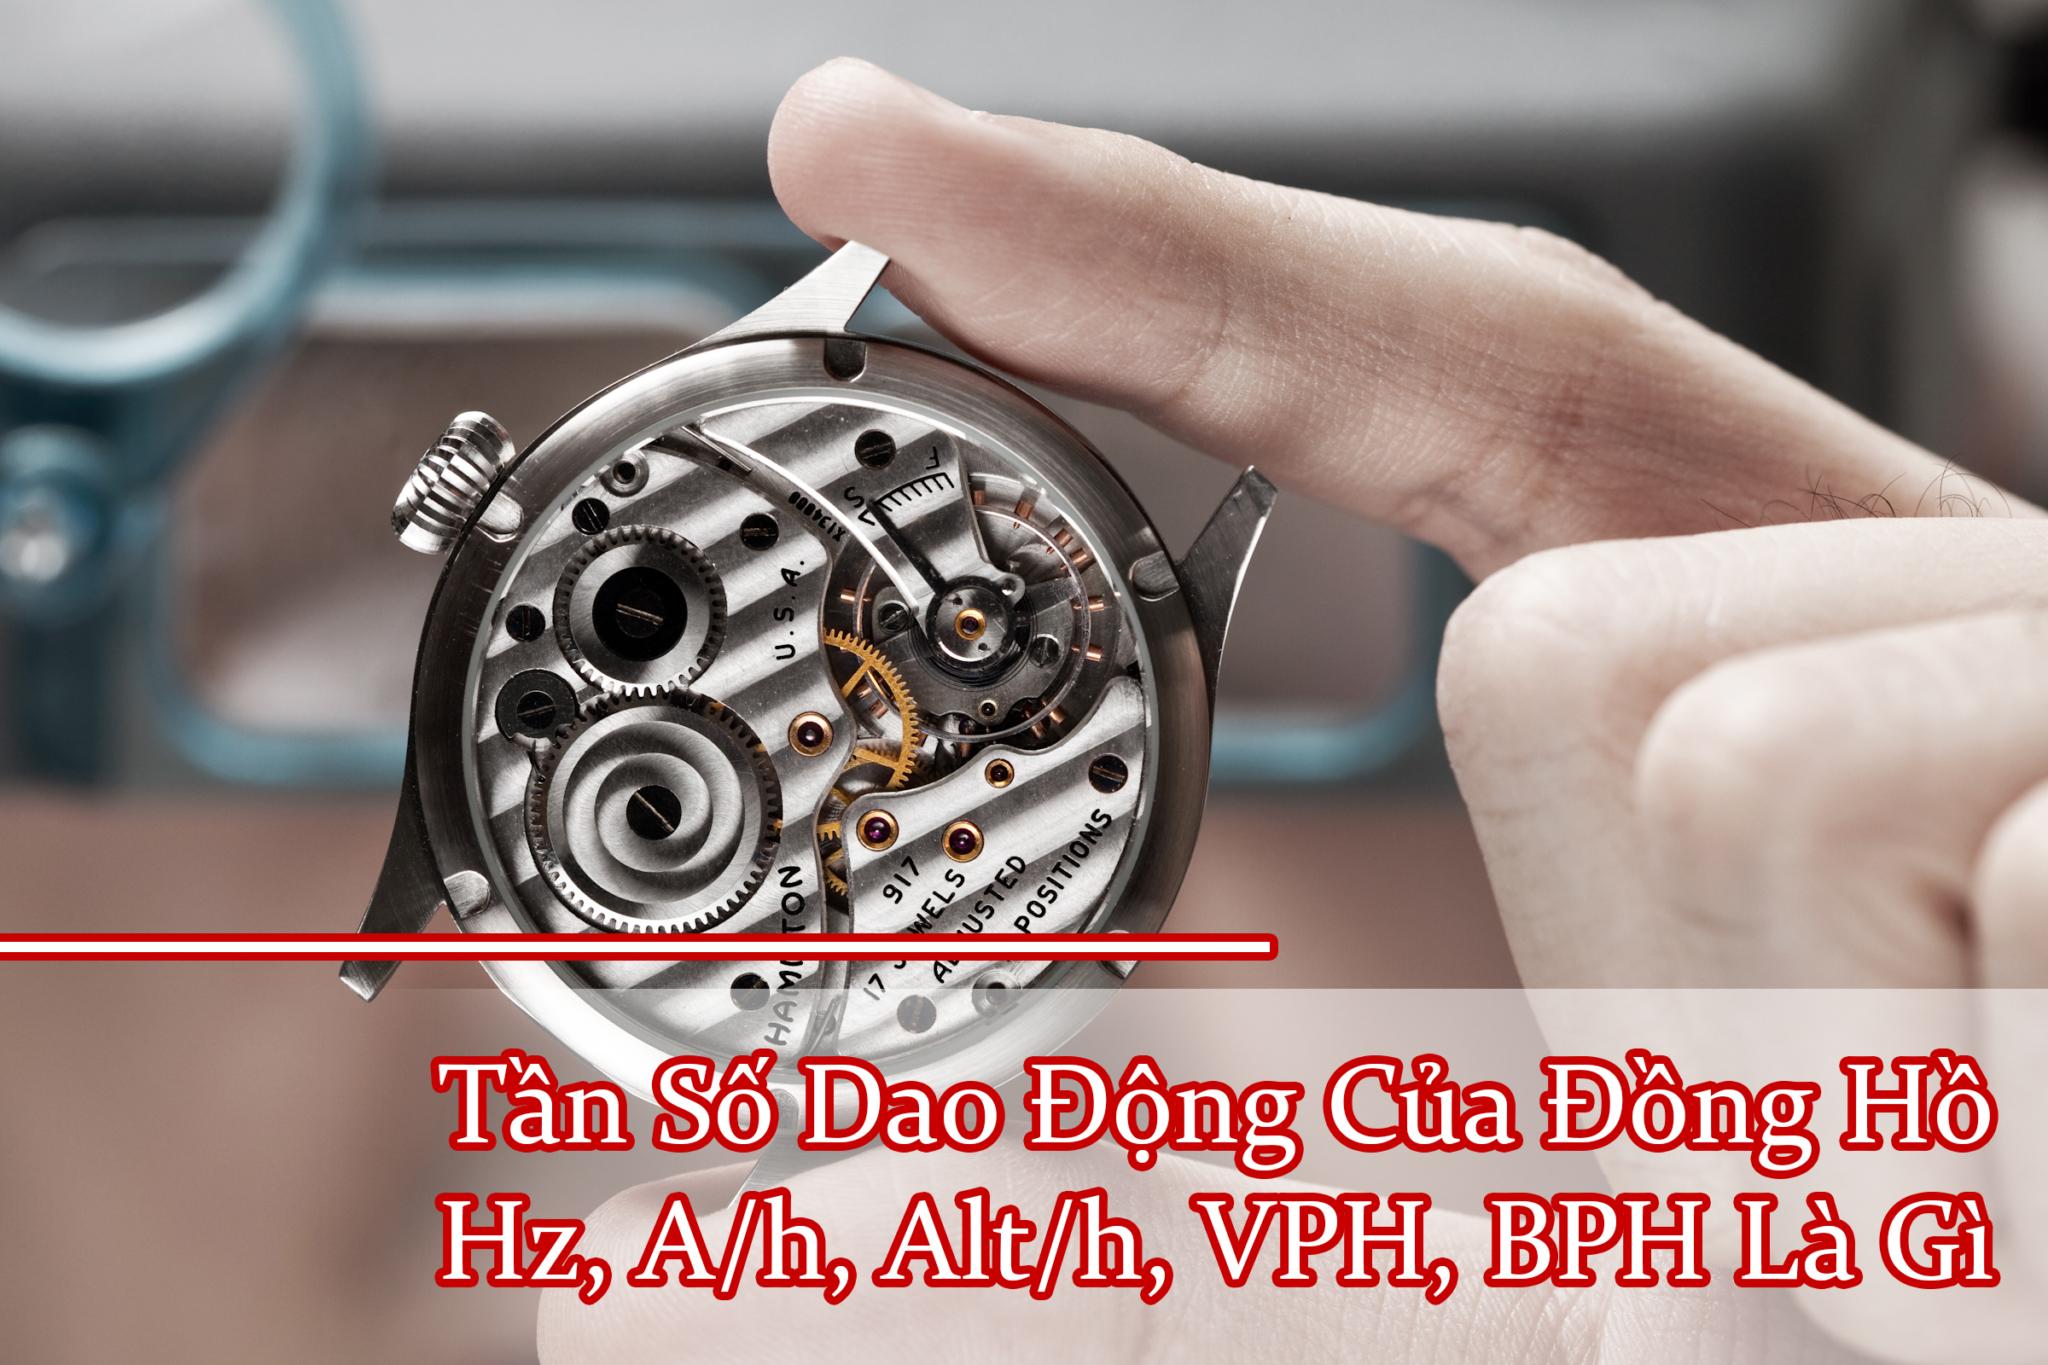 Giai Nghia Tan So Dao Dong Cua Dong Ho, Hz, A/h, Alt/h, VPH, BPH La Gi